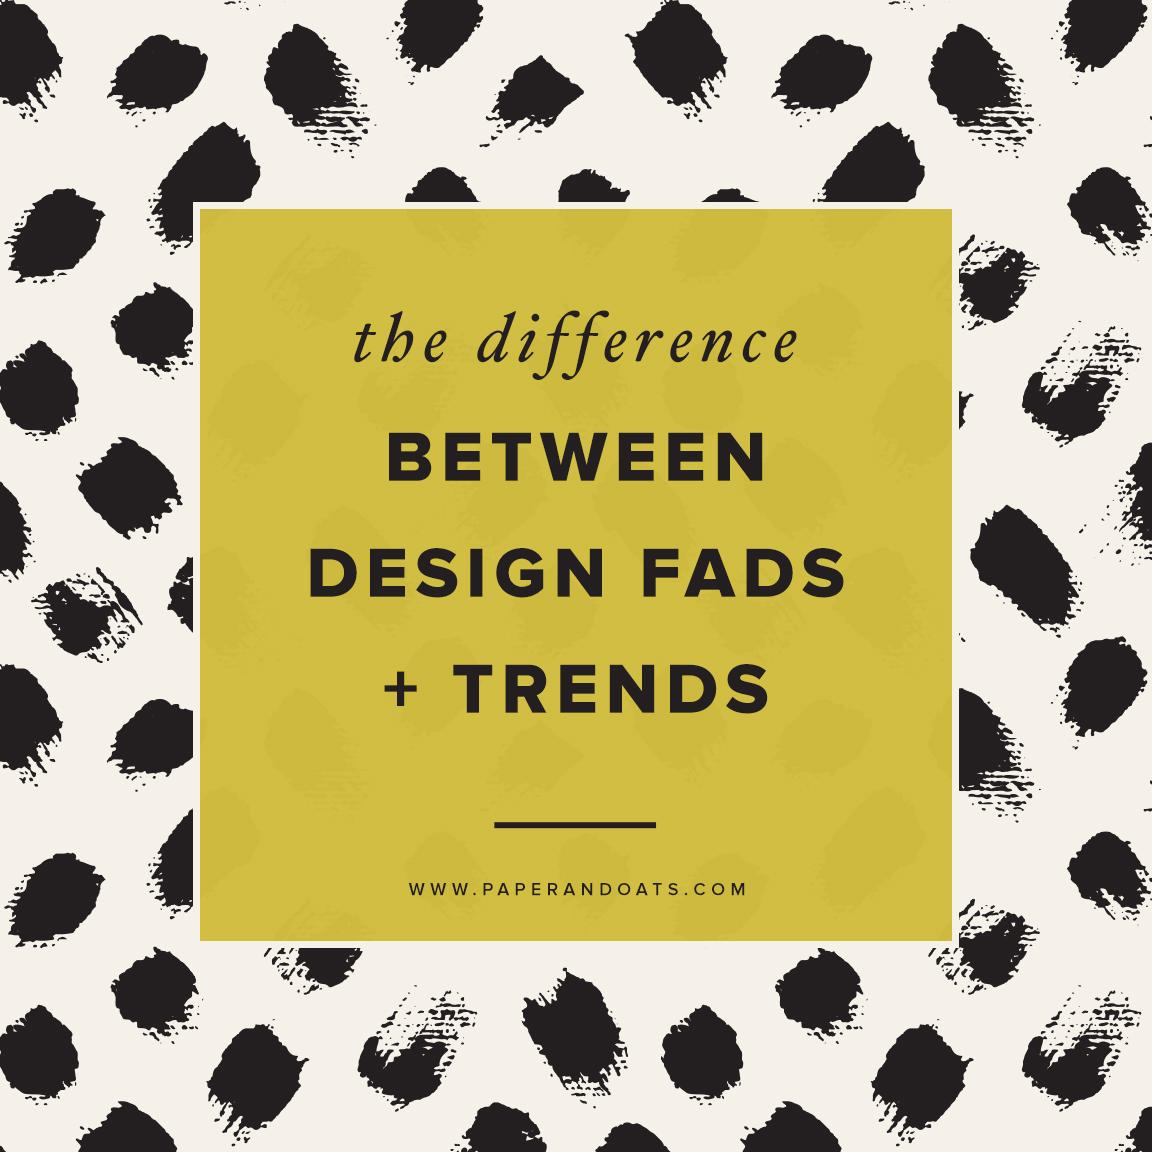 fads trends 1.jpg